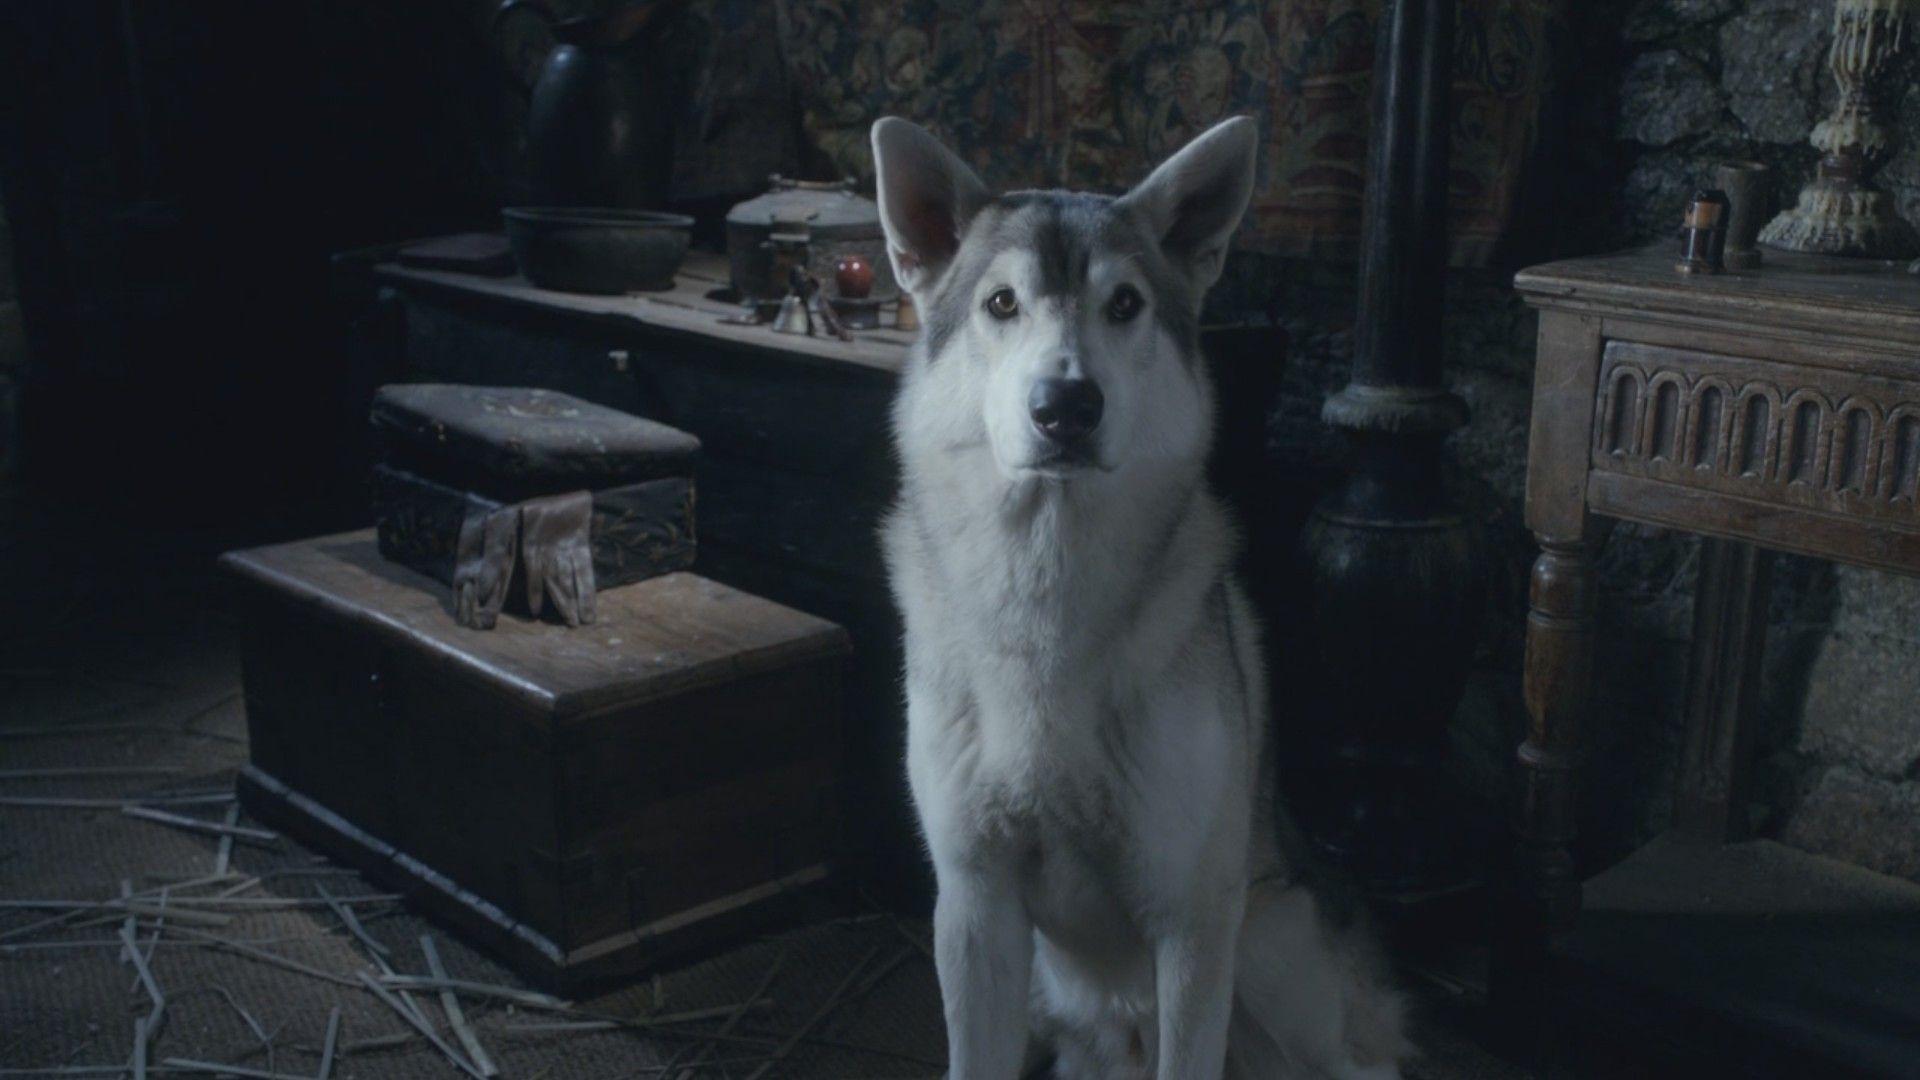 Game of Thrones - Episode Still Season 1